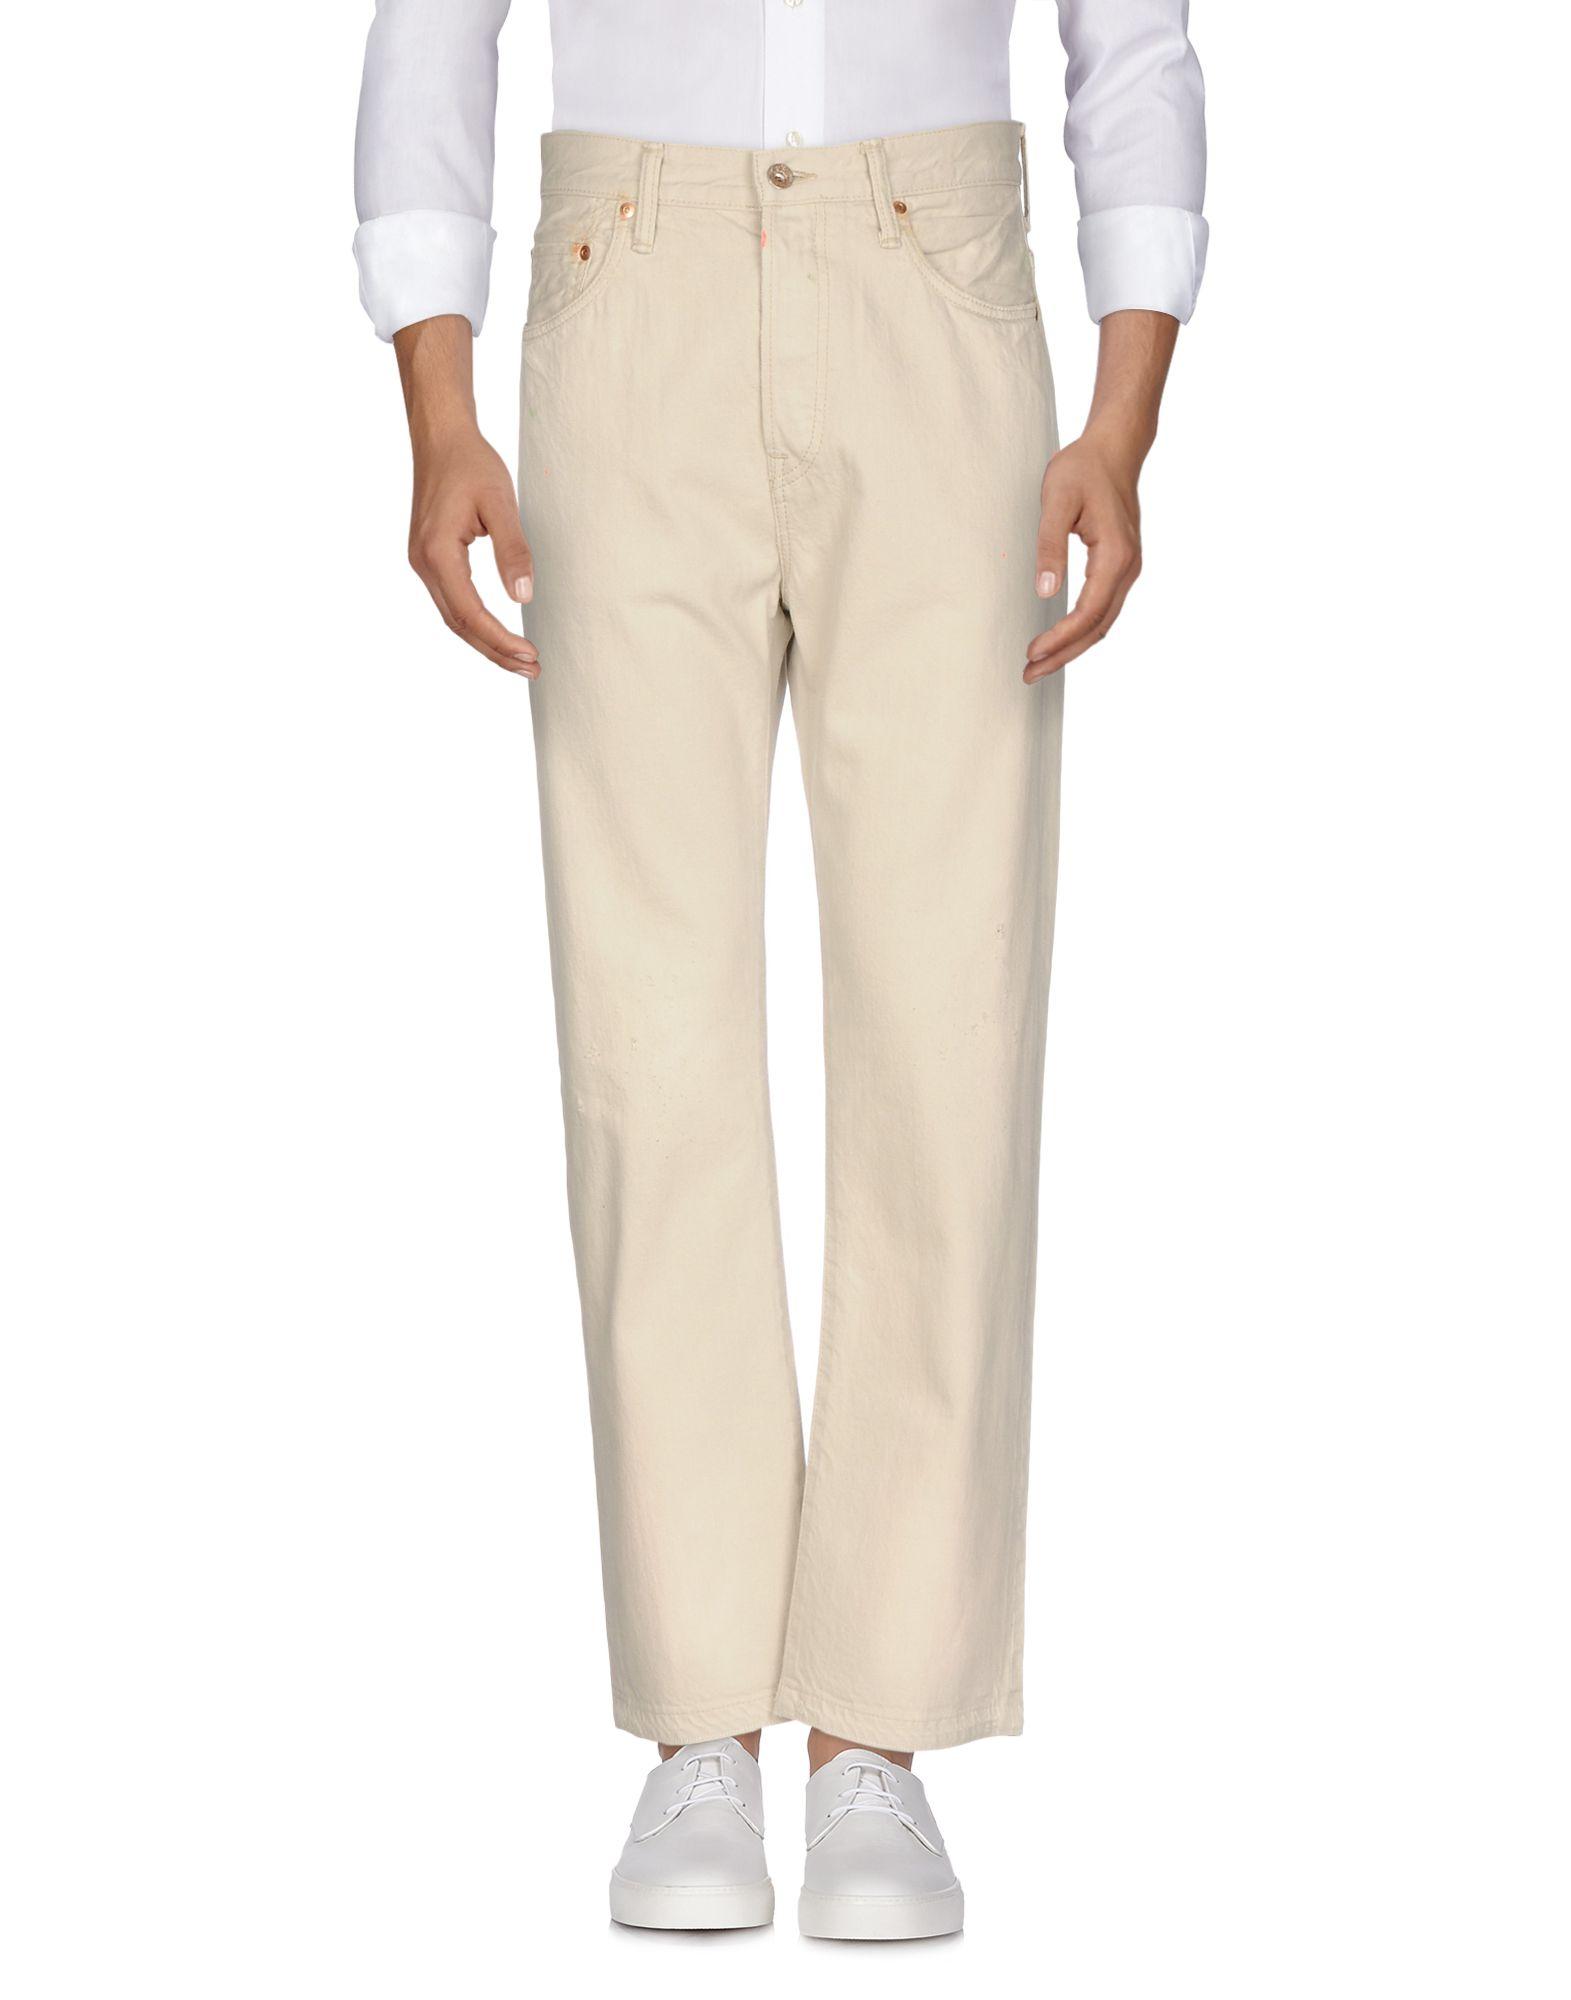 Pantaloni Jeans Chimala Uomo - Acquista online su